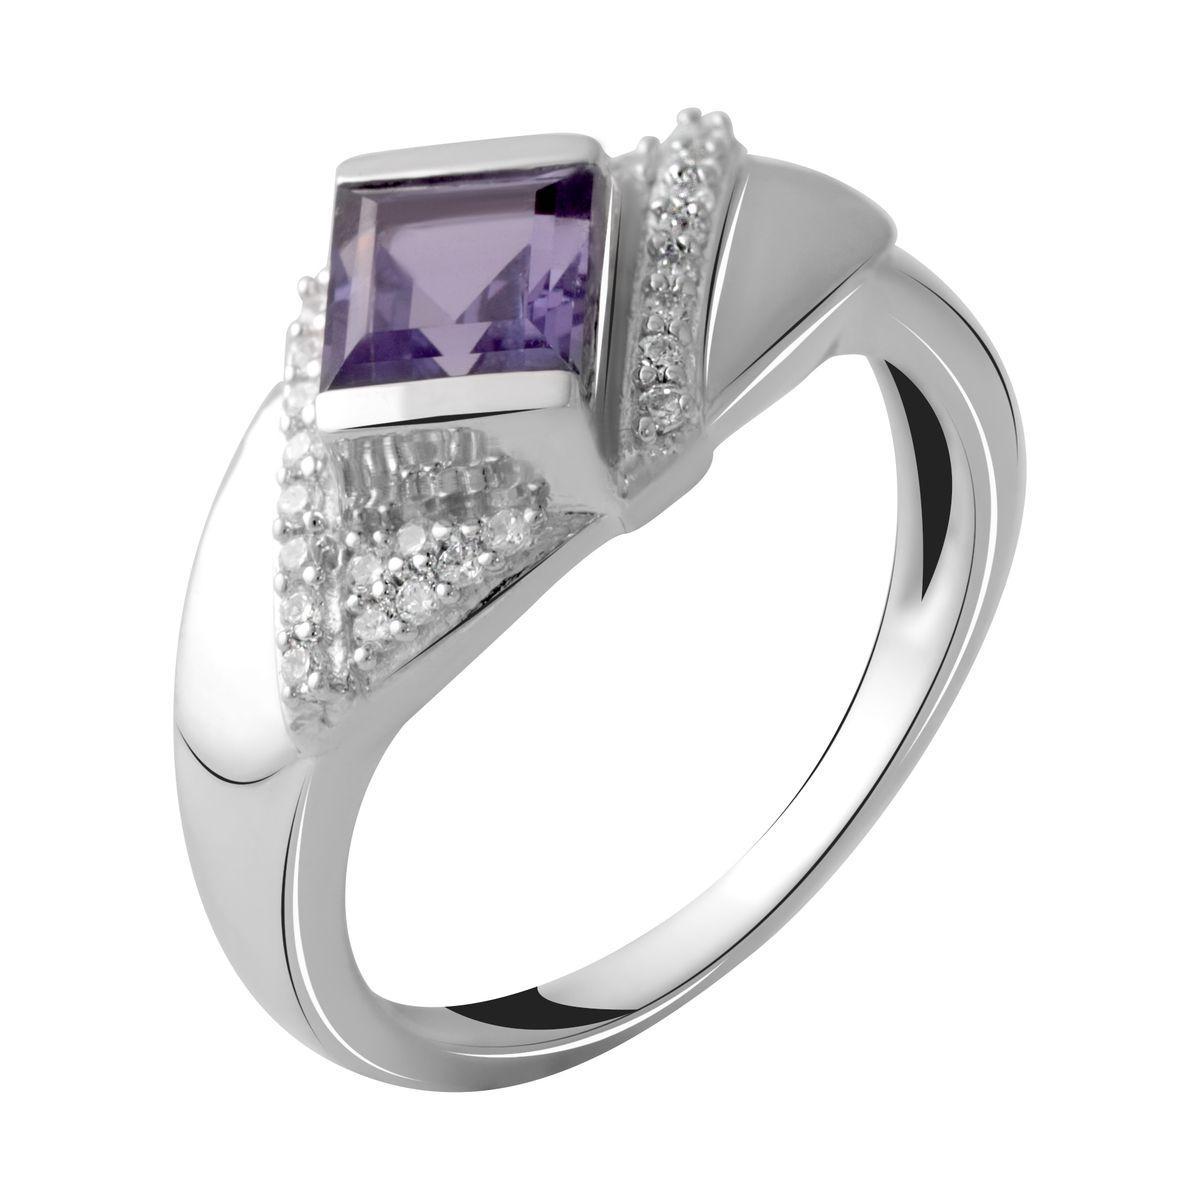 Серебряное кольцо DreamJewelry с олександритом 2.11ct (2050322) 18 размер